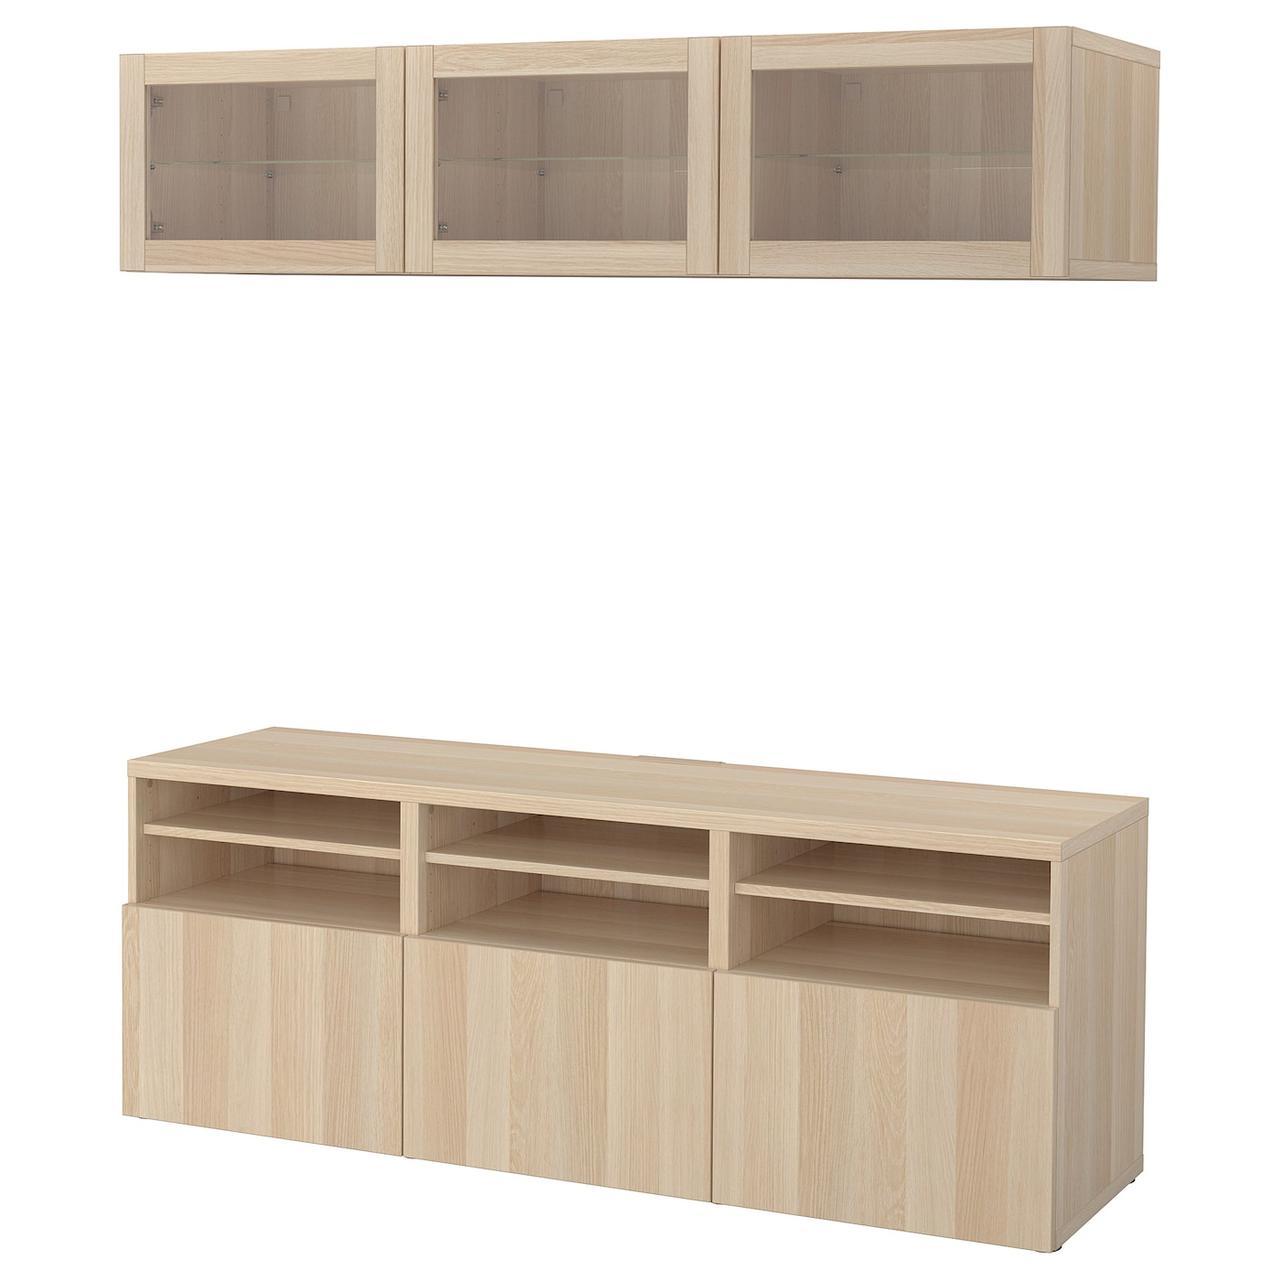 IKEA BESTÅ Шафа для ТБ 180x40x192 см